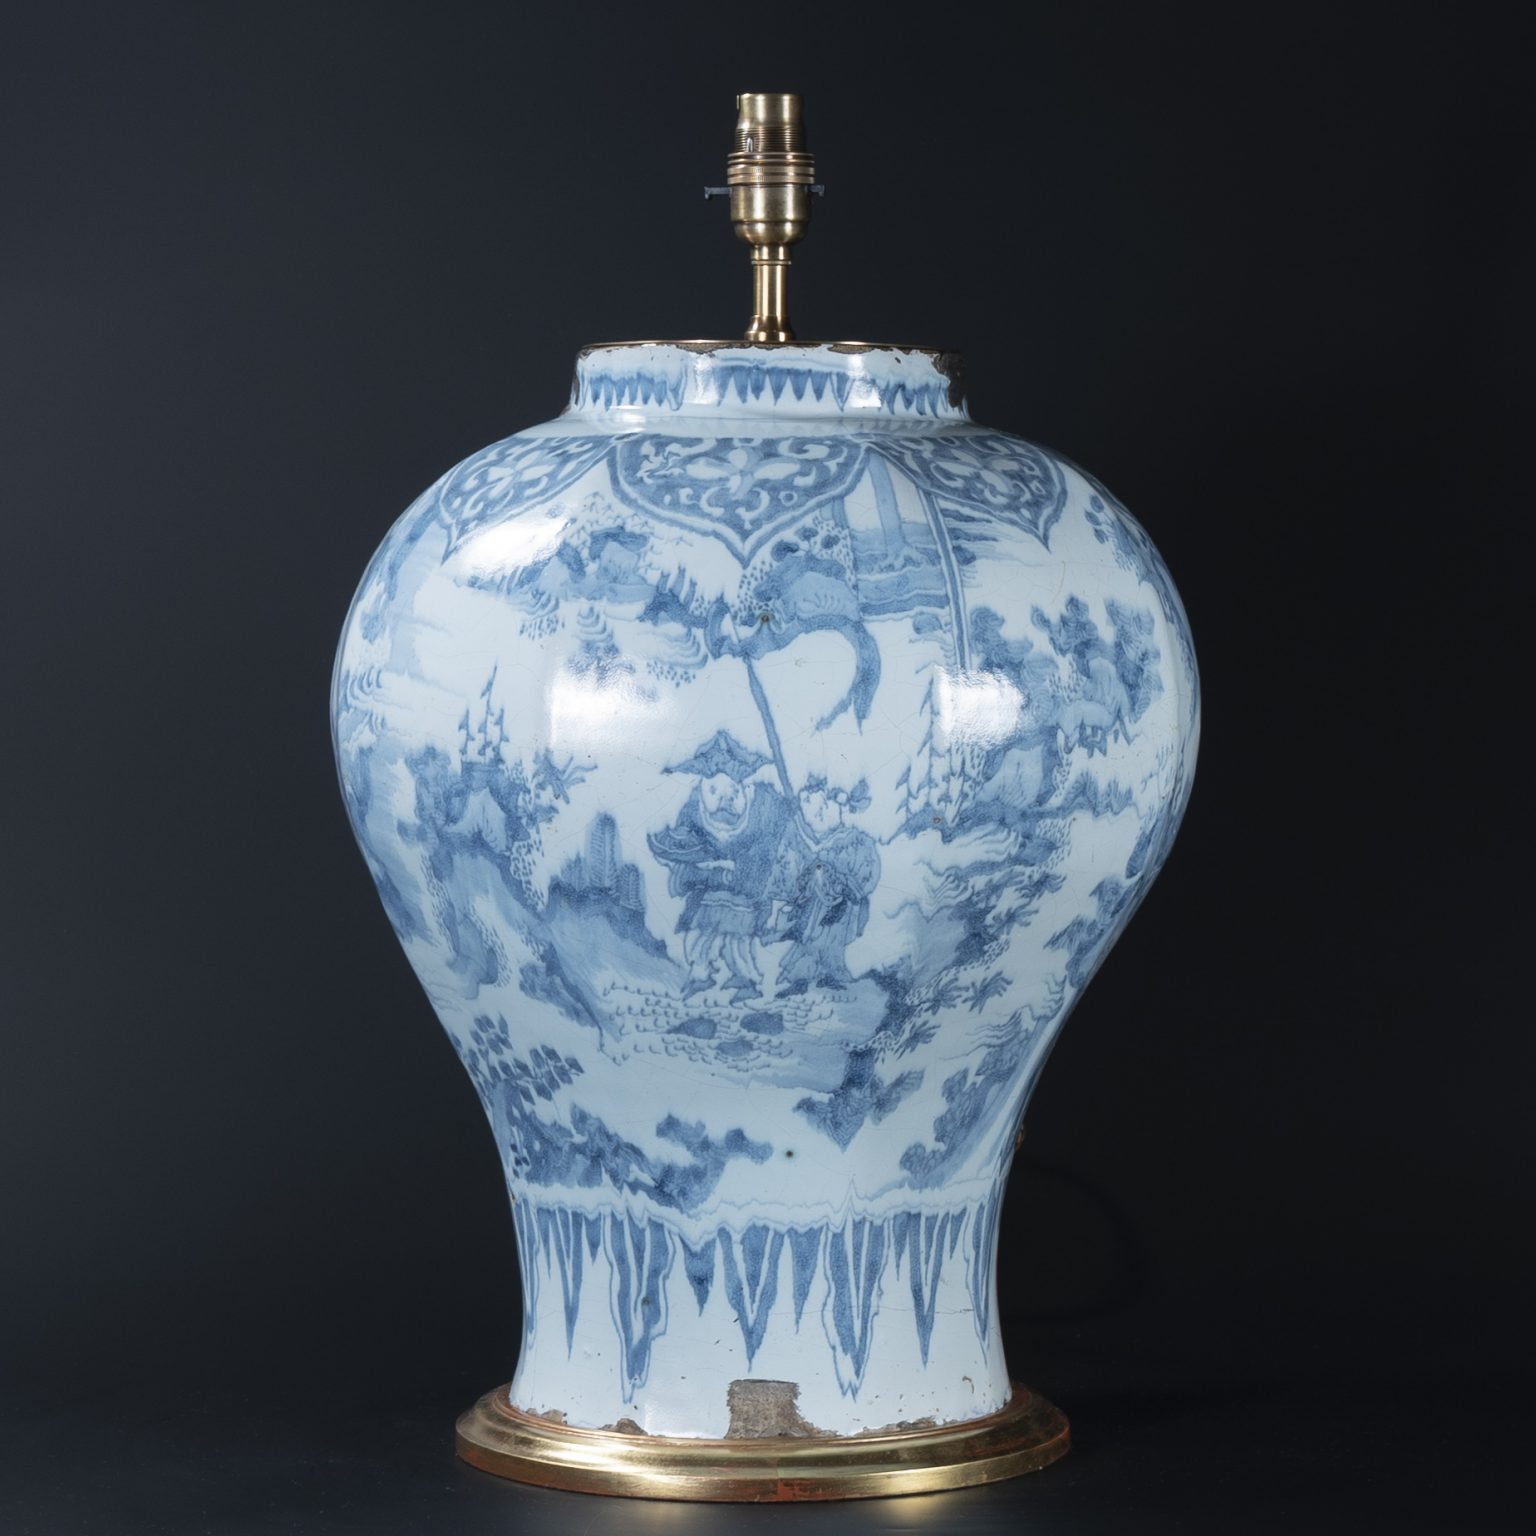 Large 17th Century Dutch Delft Octagonal Vase as a Lamp